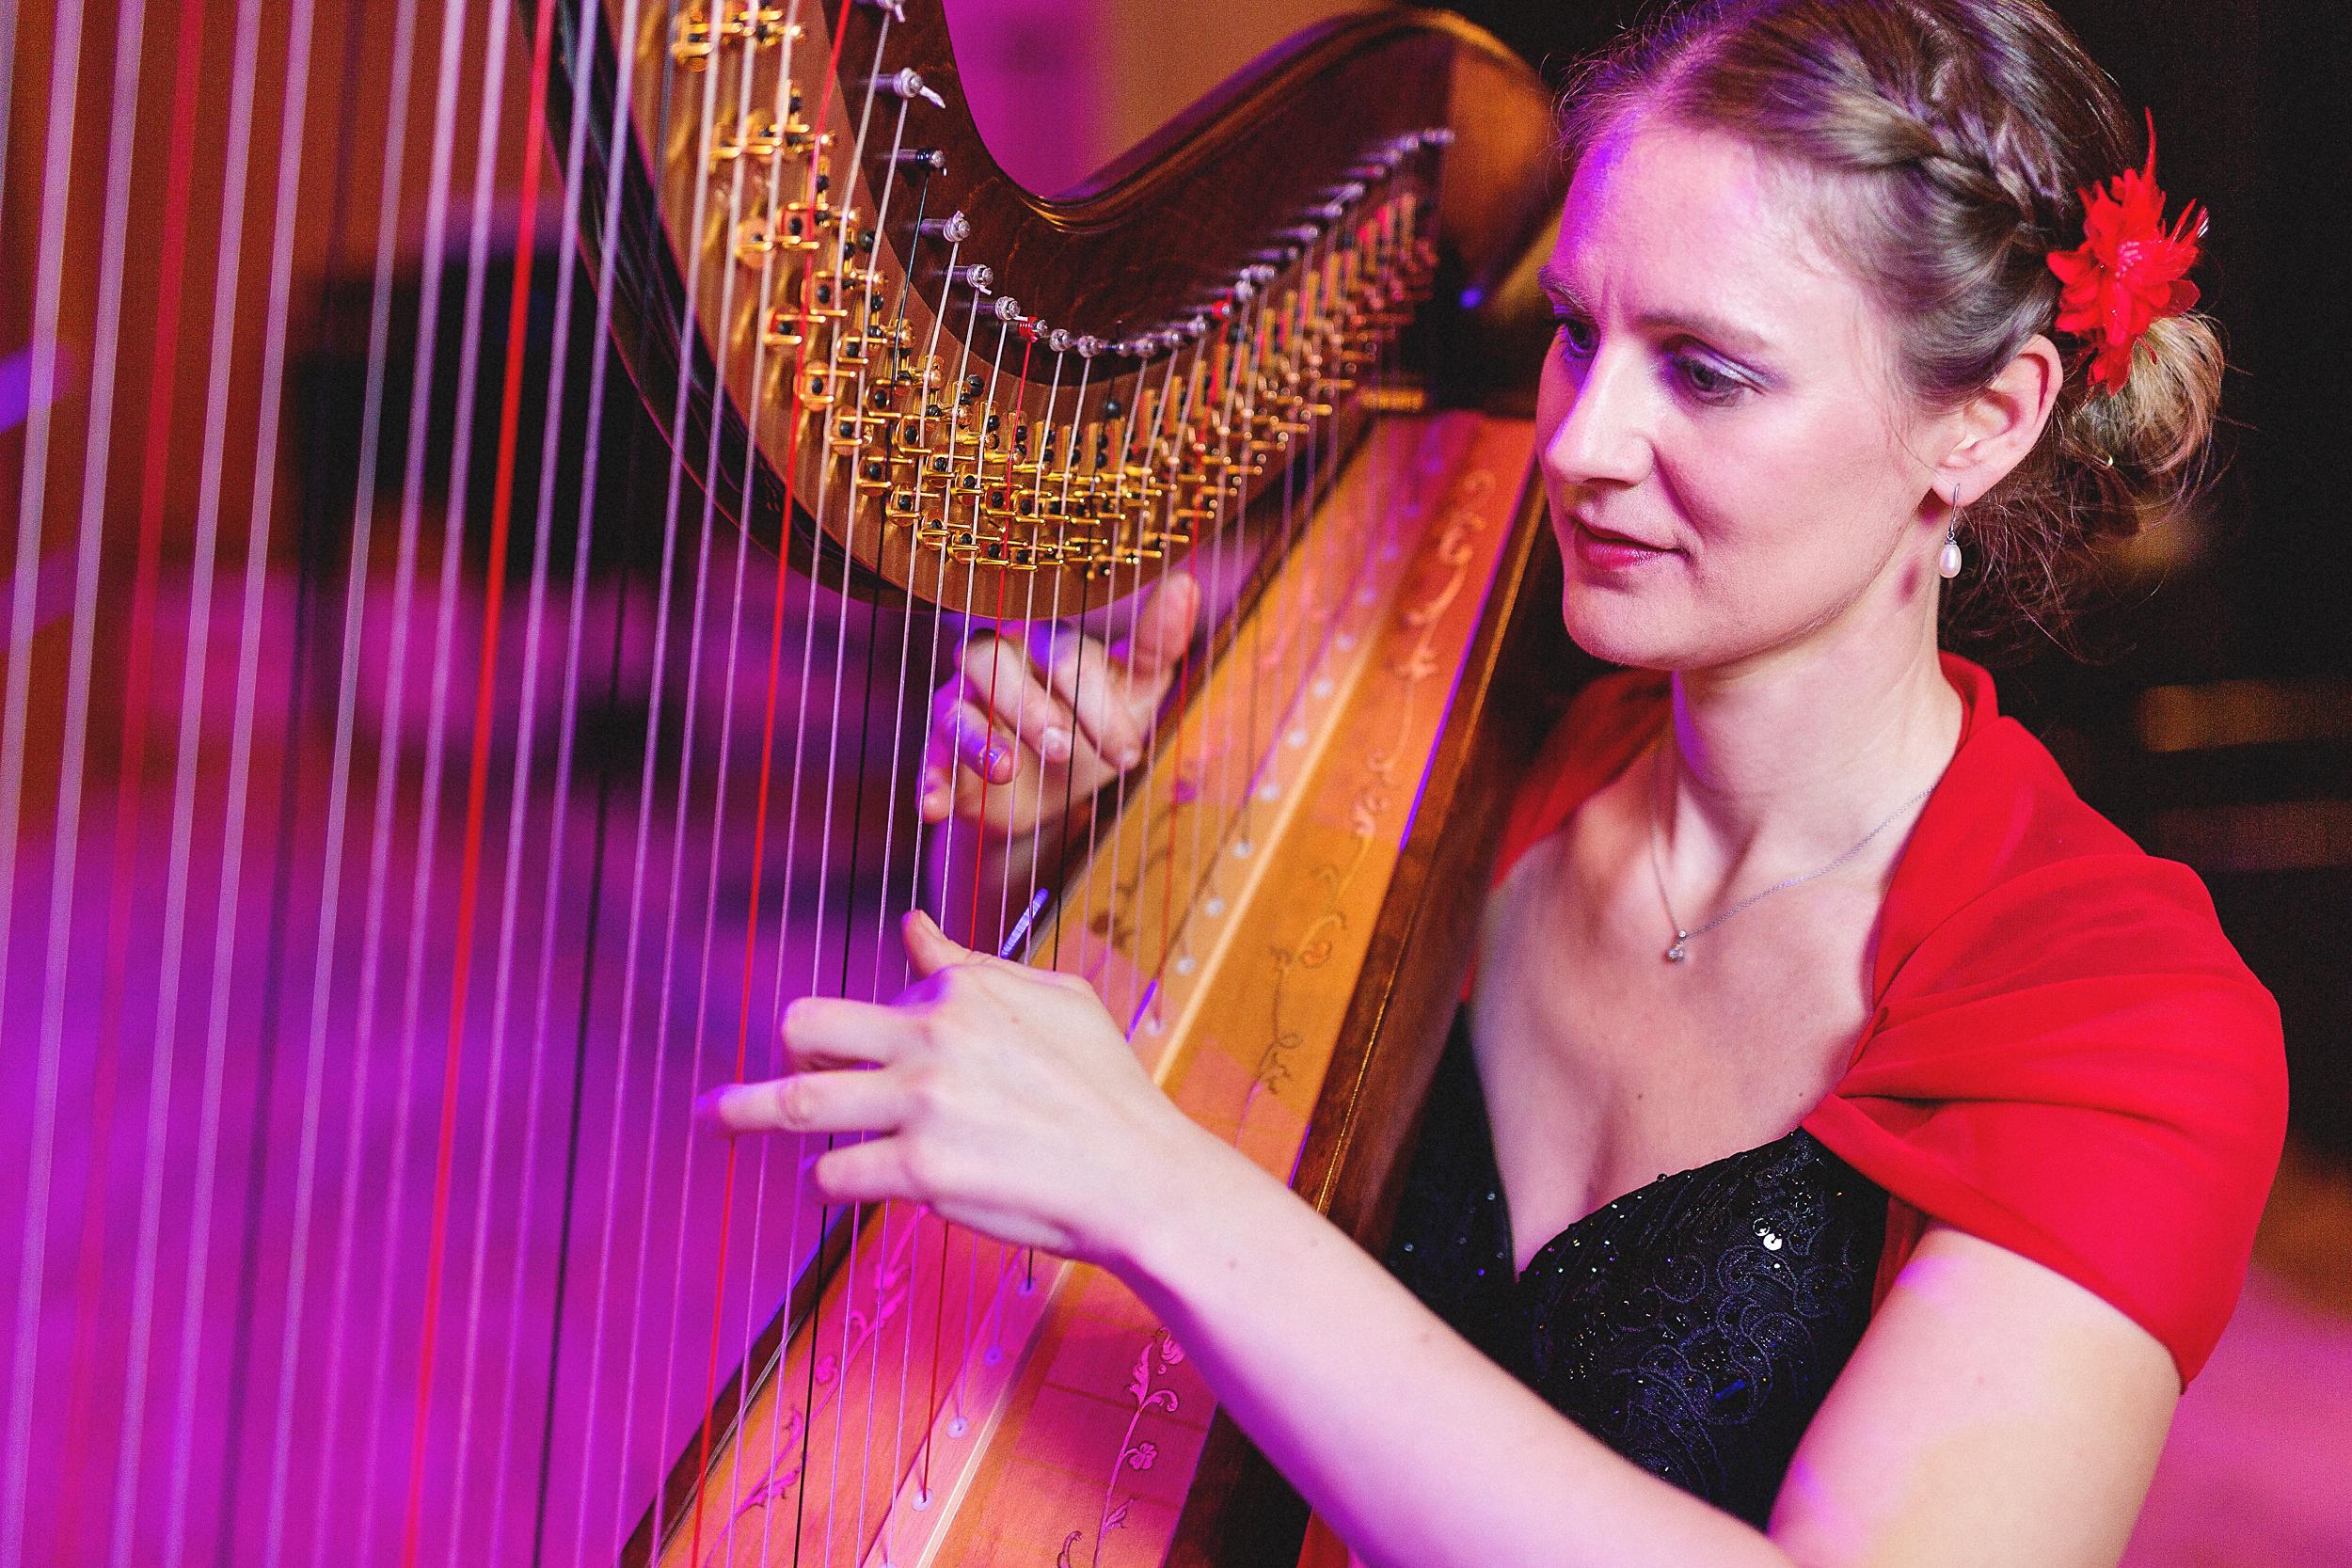 Solokonzert: Baroque flamenco